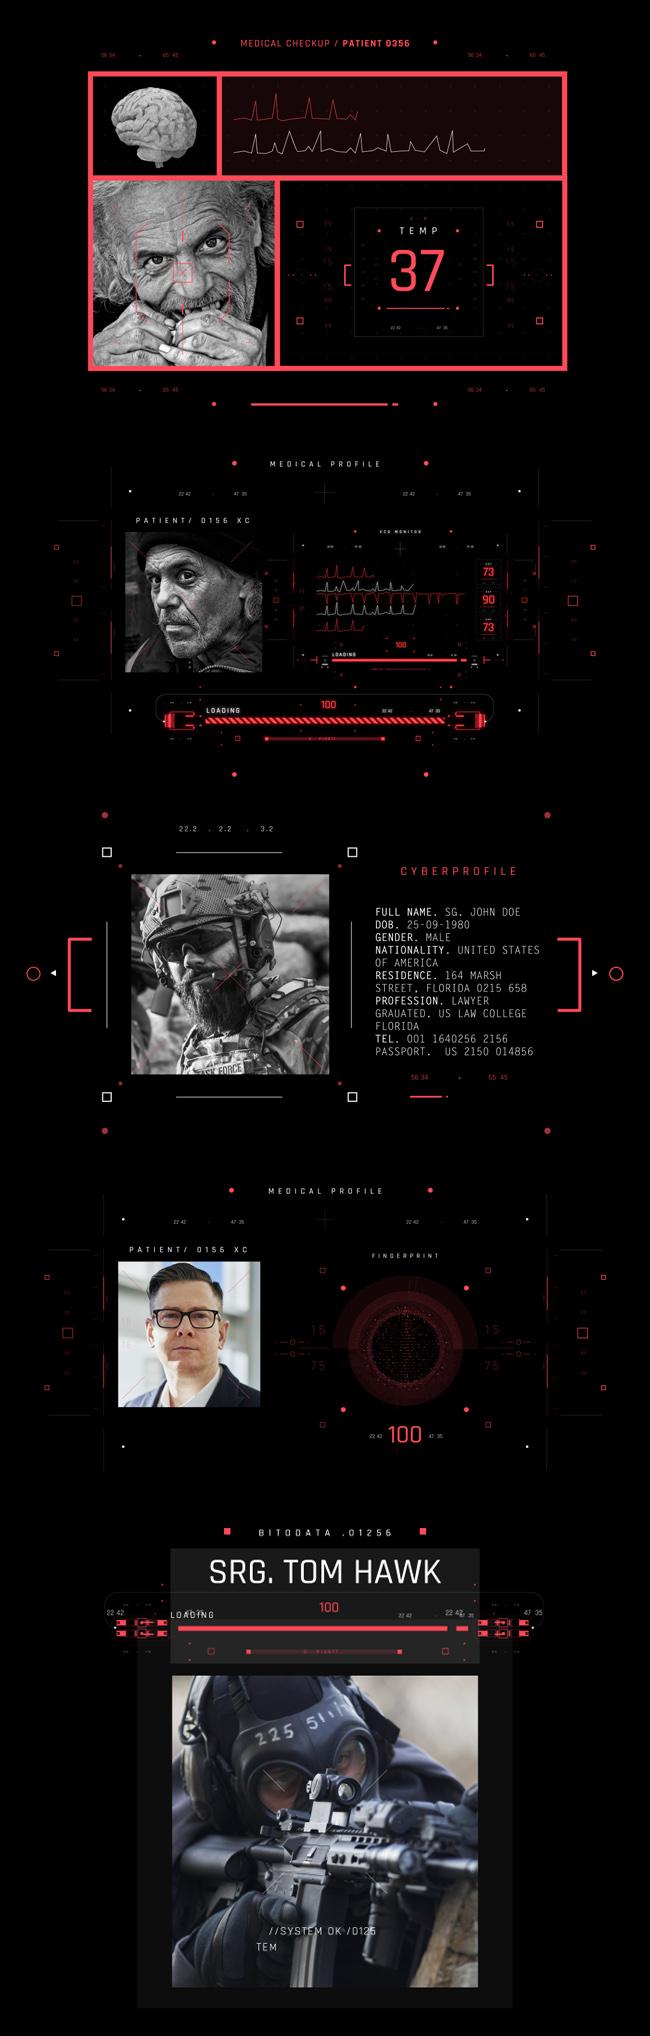 AE脚本-500个HUD高科技赛博朋克UI科幻界面元素动画预设包 Cyberpunk HUD UI 500+ 已修复中文版AE表达式报错插图24